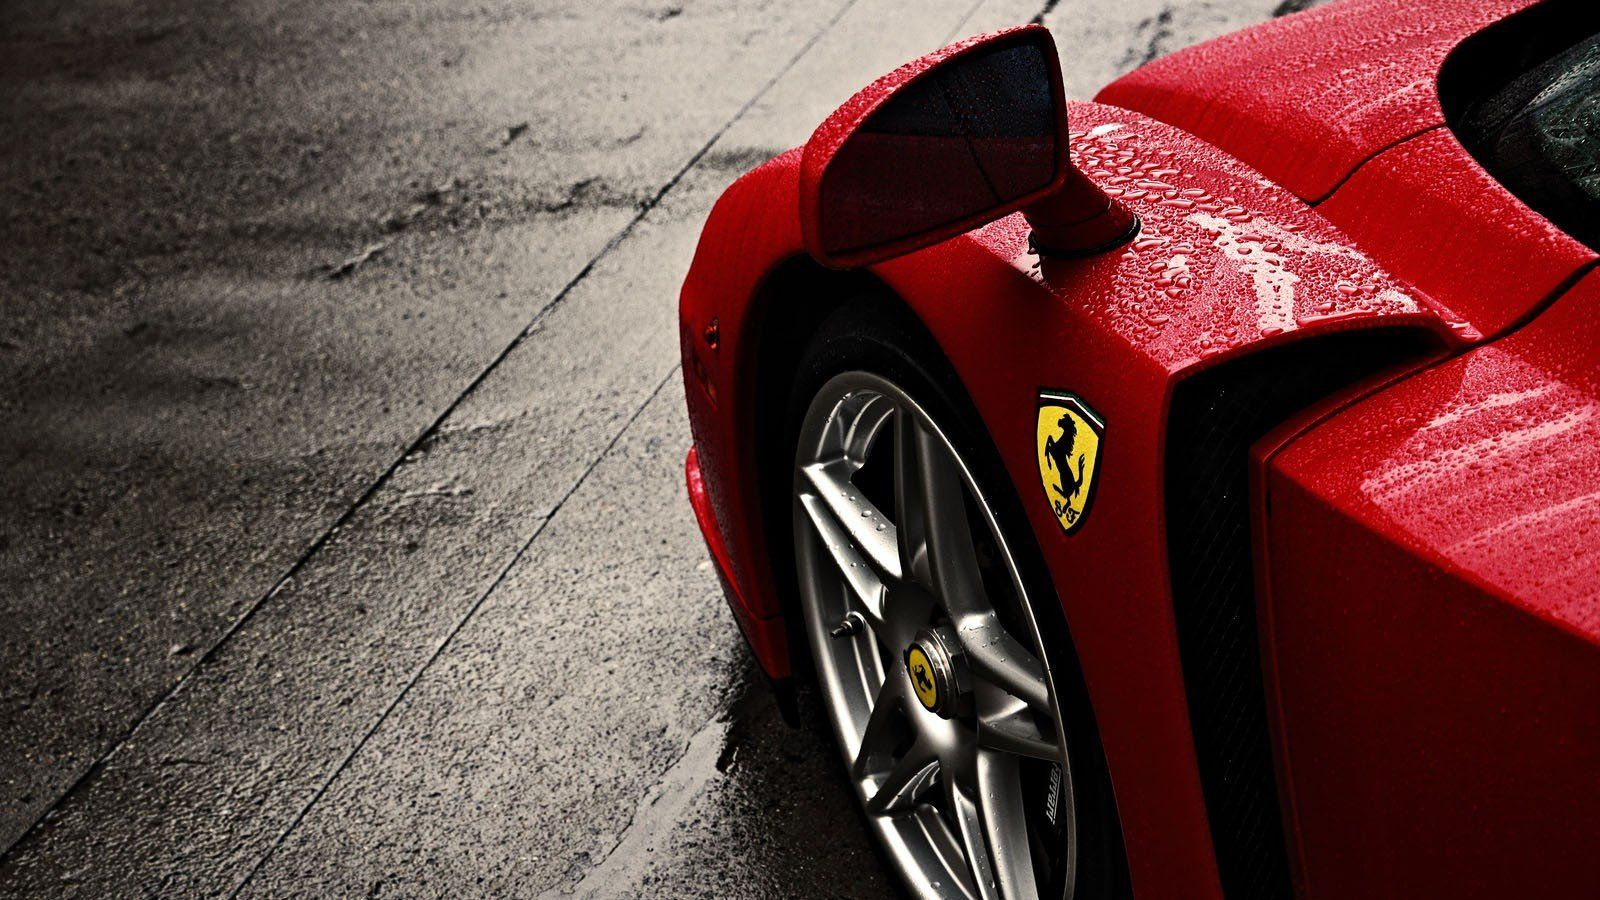 Cars Ferrari Enzo Logo Rain Wheel Widescreen Desktop Mobile Iphone Android Hd Wallpaper And